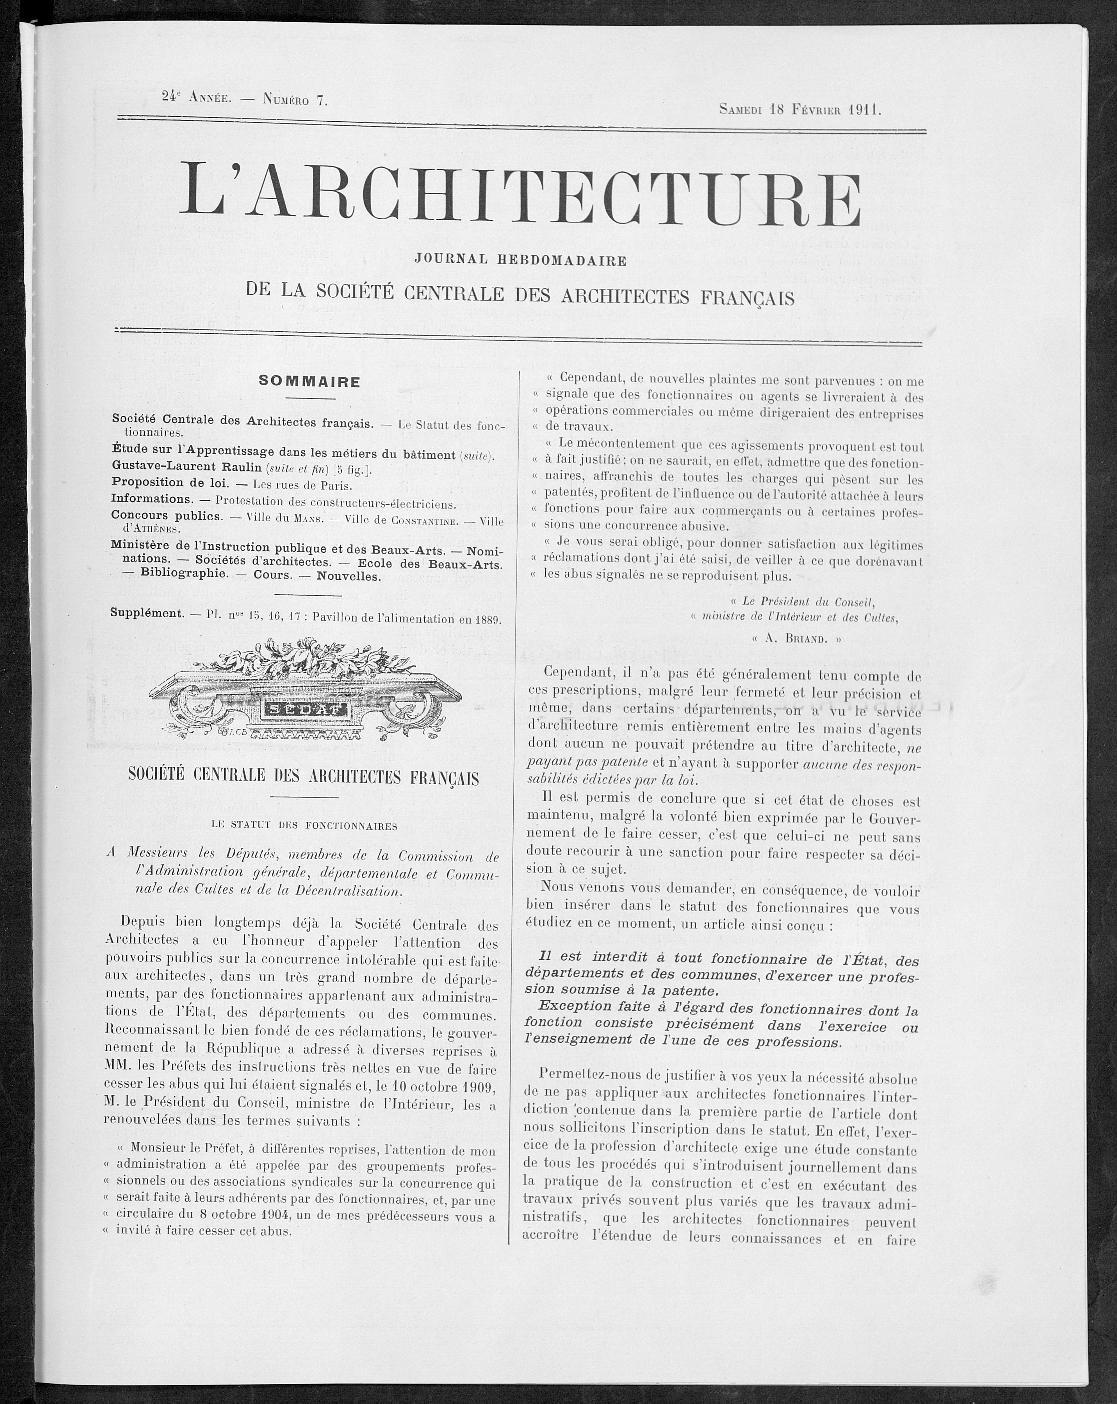 F:\Numerisation\TURE\FRAPN02_TURE_1911_07.pdf  